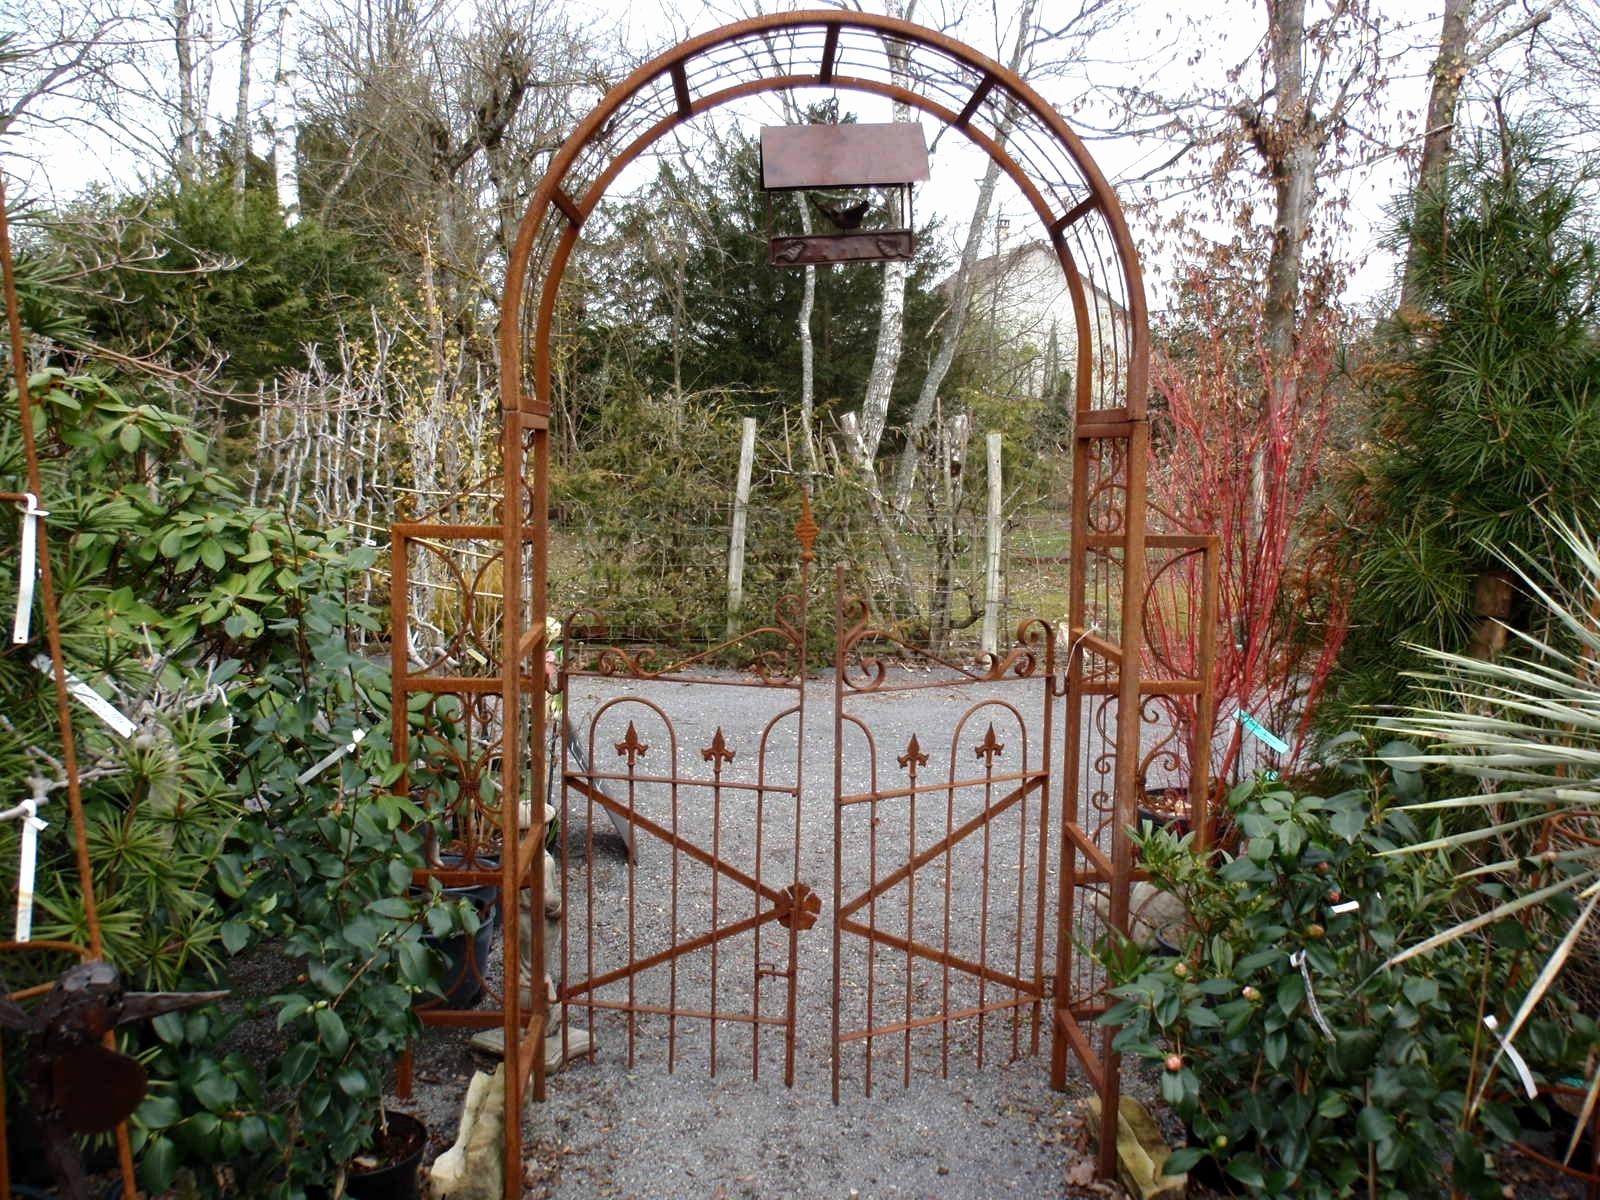 Barriere Jardin Castorama Frais Photos Cloture Jardin Castorama Beau Portillon Jardin Castorama Inspirant